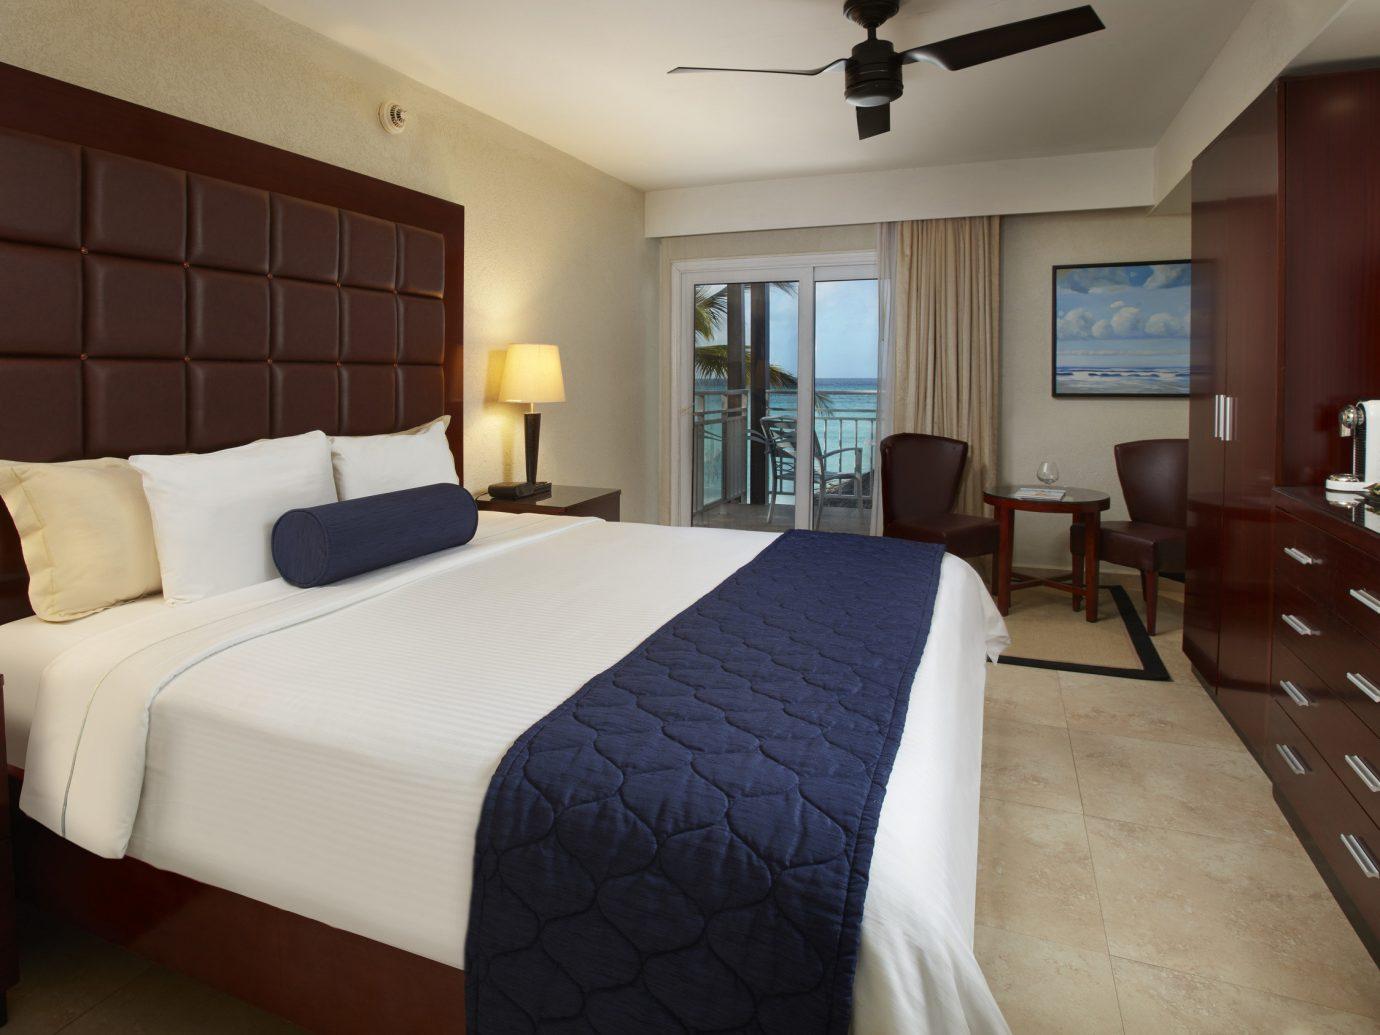 Hotels indoor bed floor wall hotel room Bedroom property Suite ceiling estate cottage real estate nice interior design apartment lamp